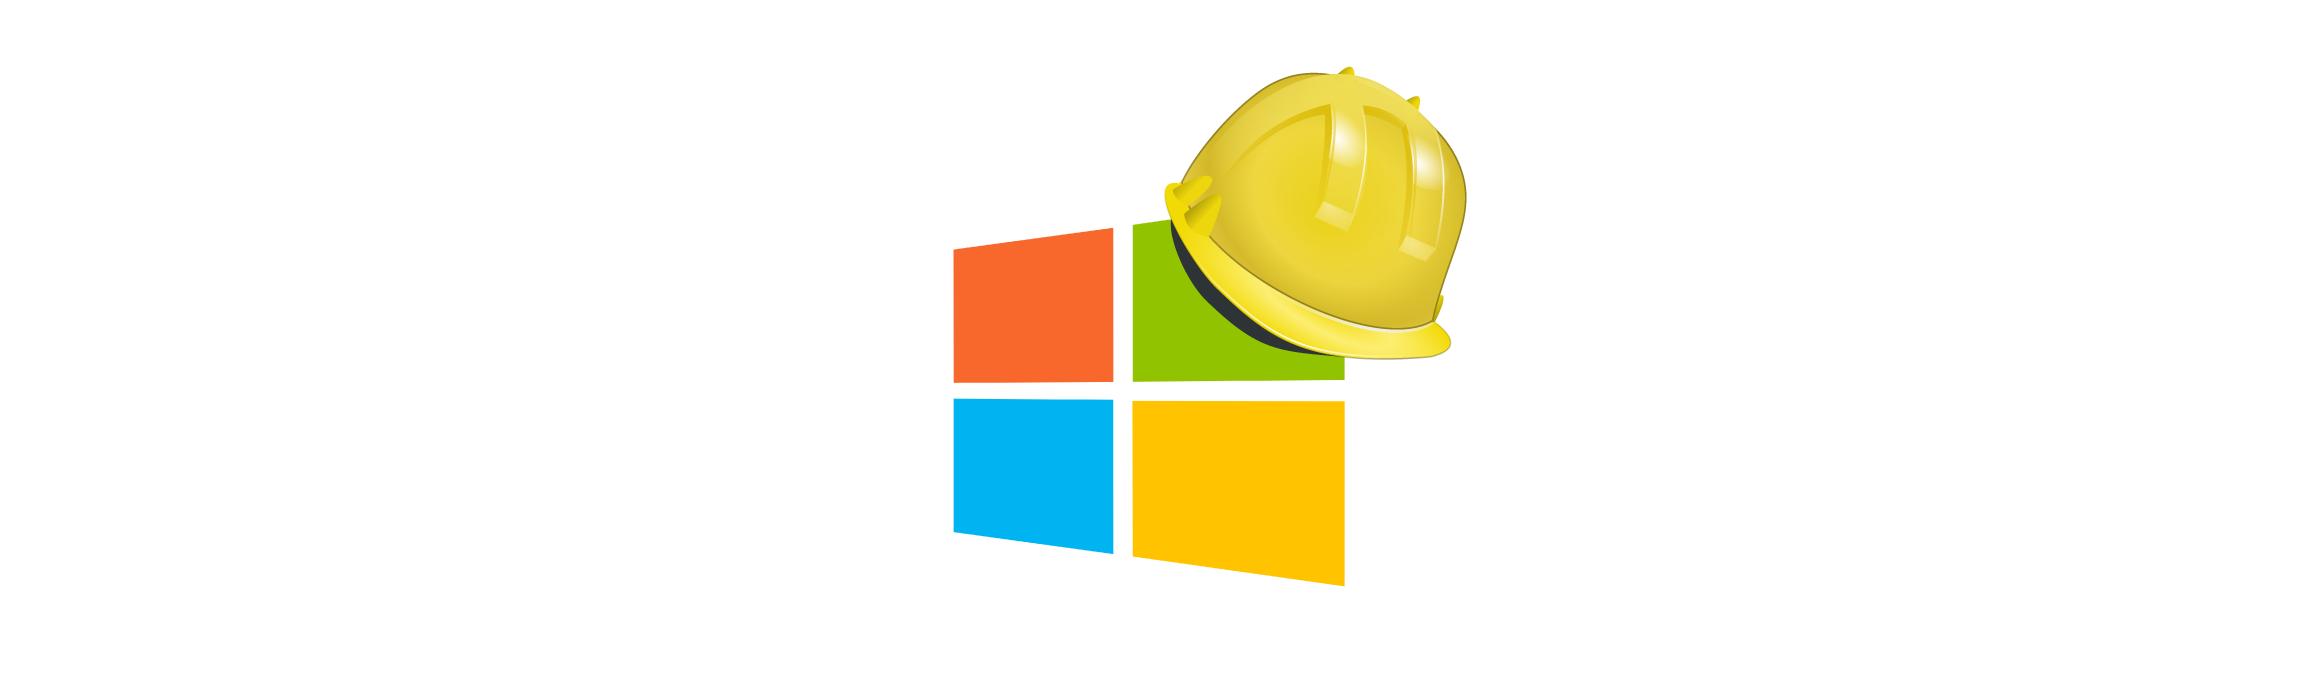 Windows Foreman Logo